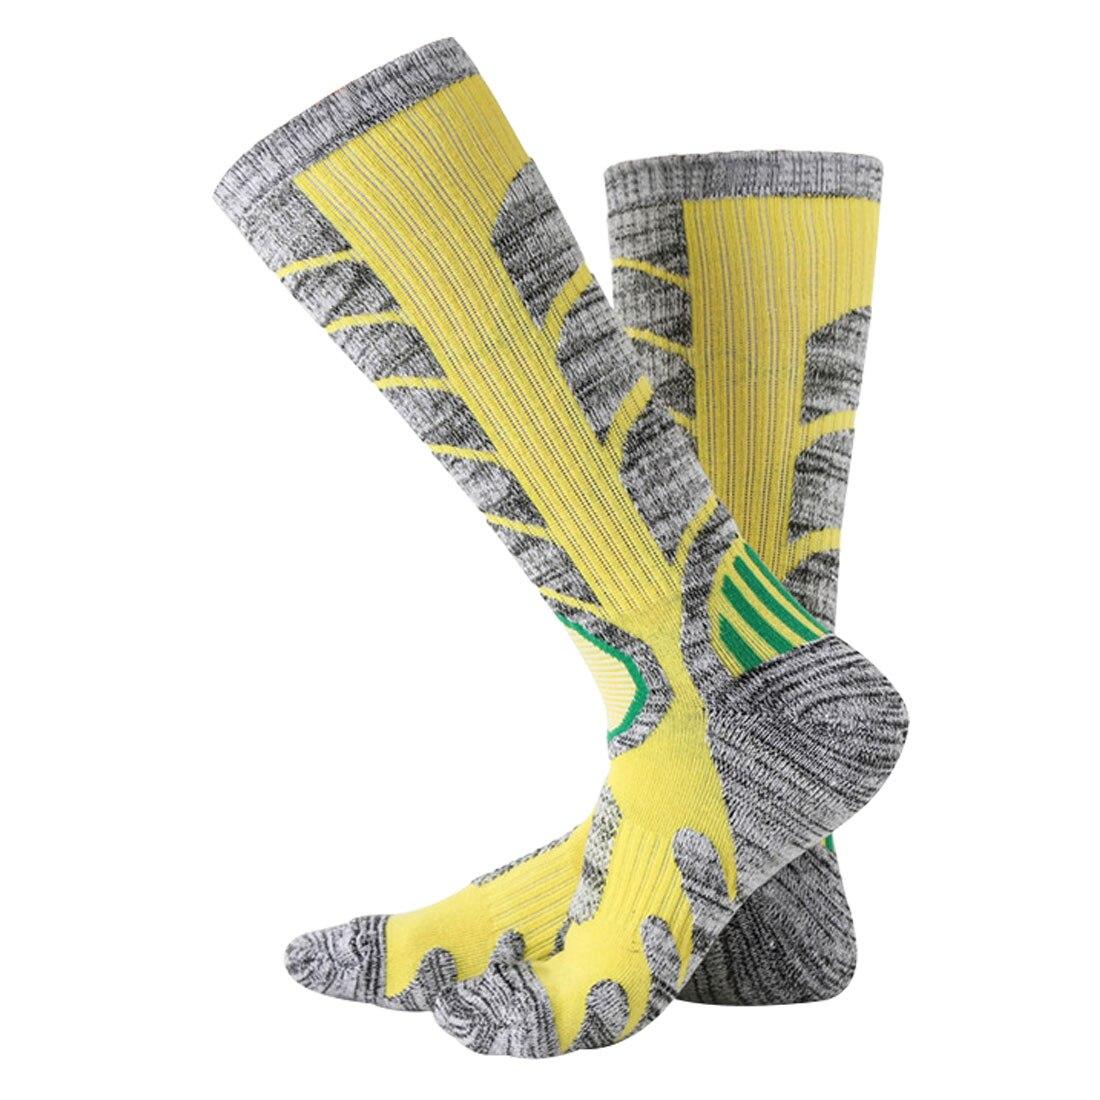 2018 NEW Men Women Thermal Ski Socks Thick Cotton Sports Snowboard Cycling Skiing Soccer Socks Leg Warmers Long Socks